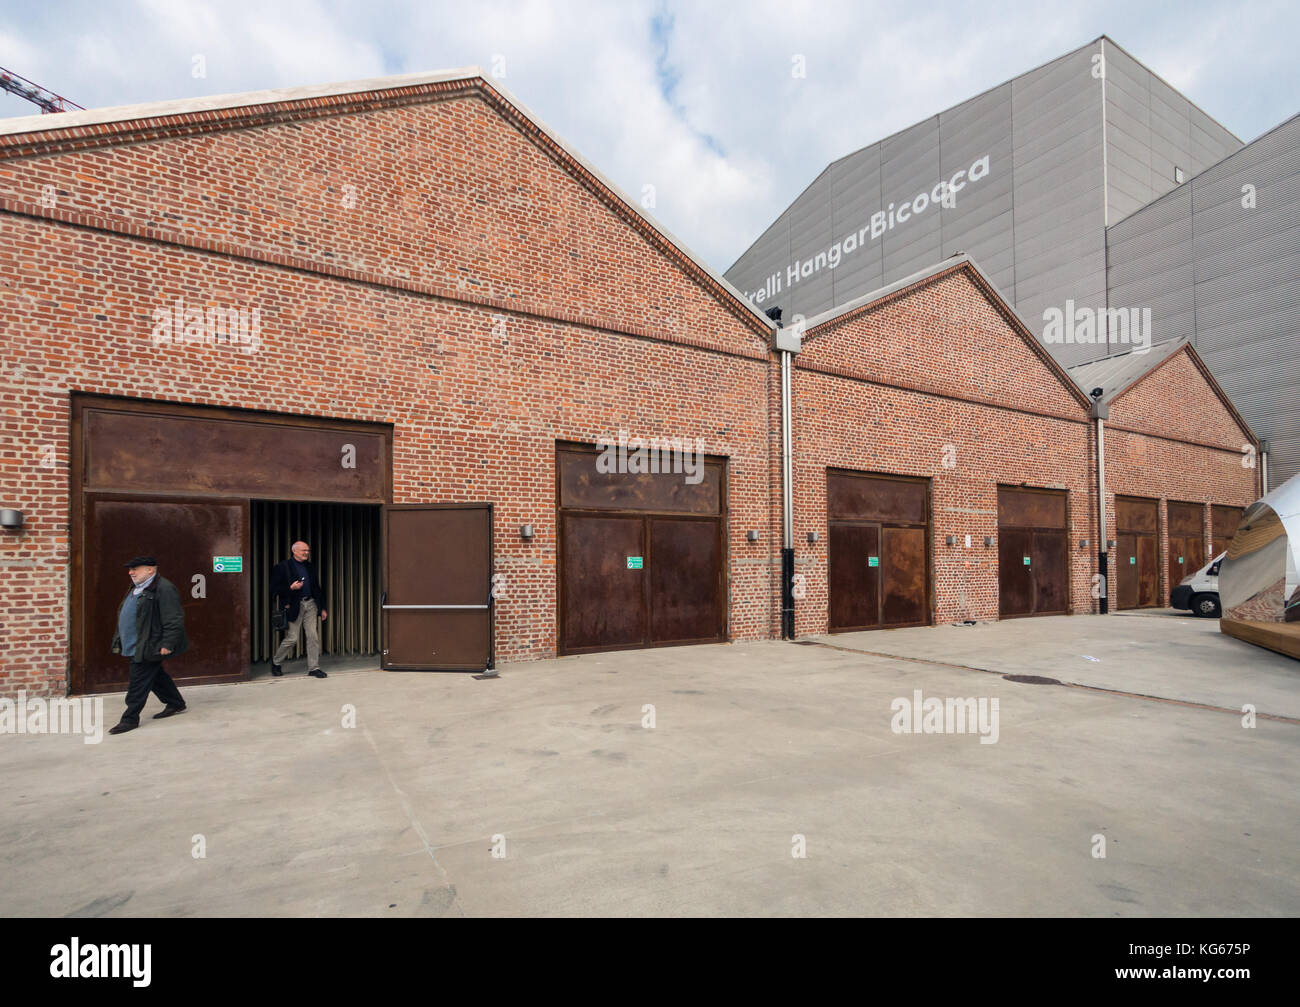 The Pirelli HangarBicocca exhibition space and art gallery, Milan, exterior view, Aplir 2016 - Stock Image